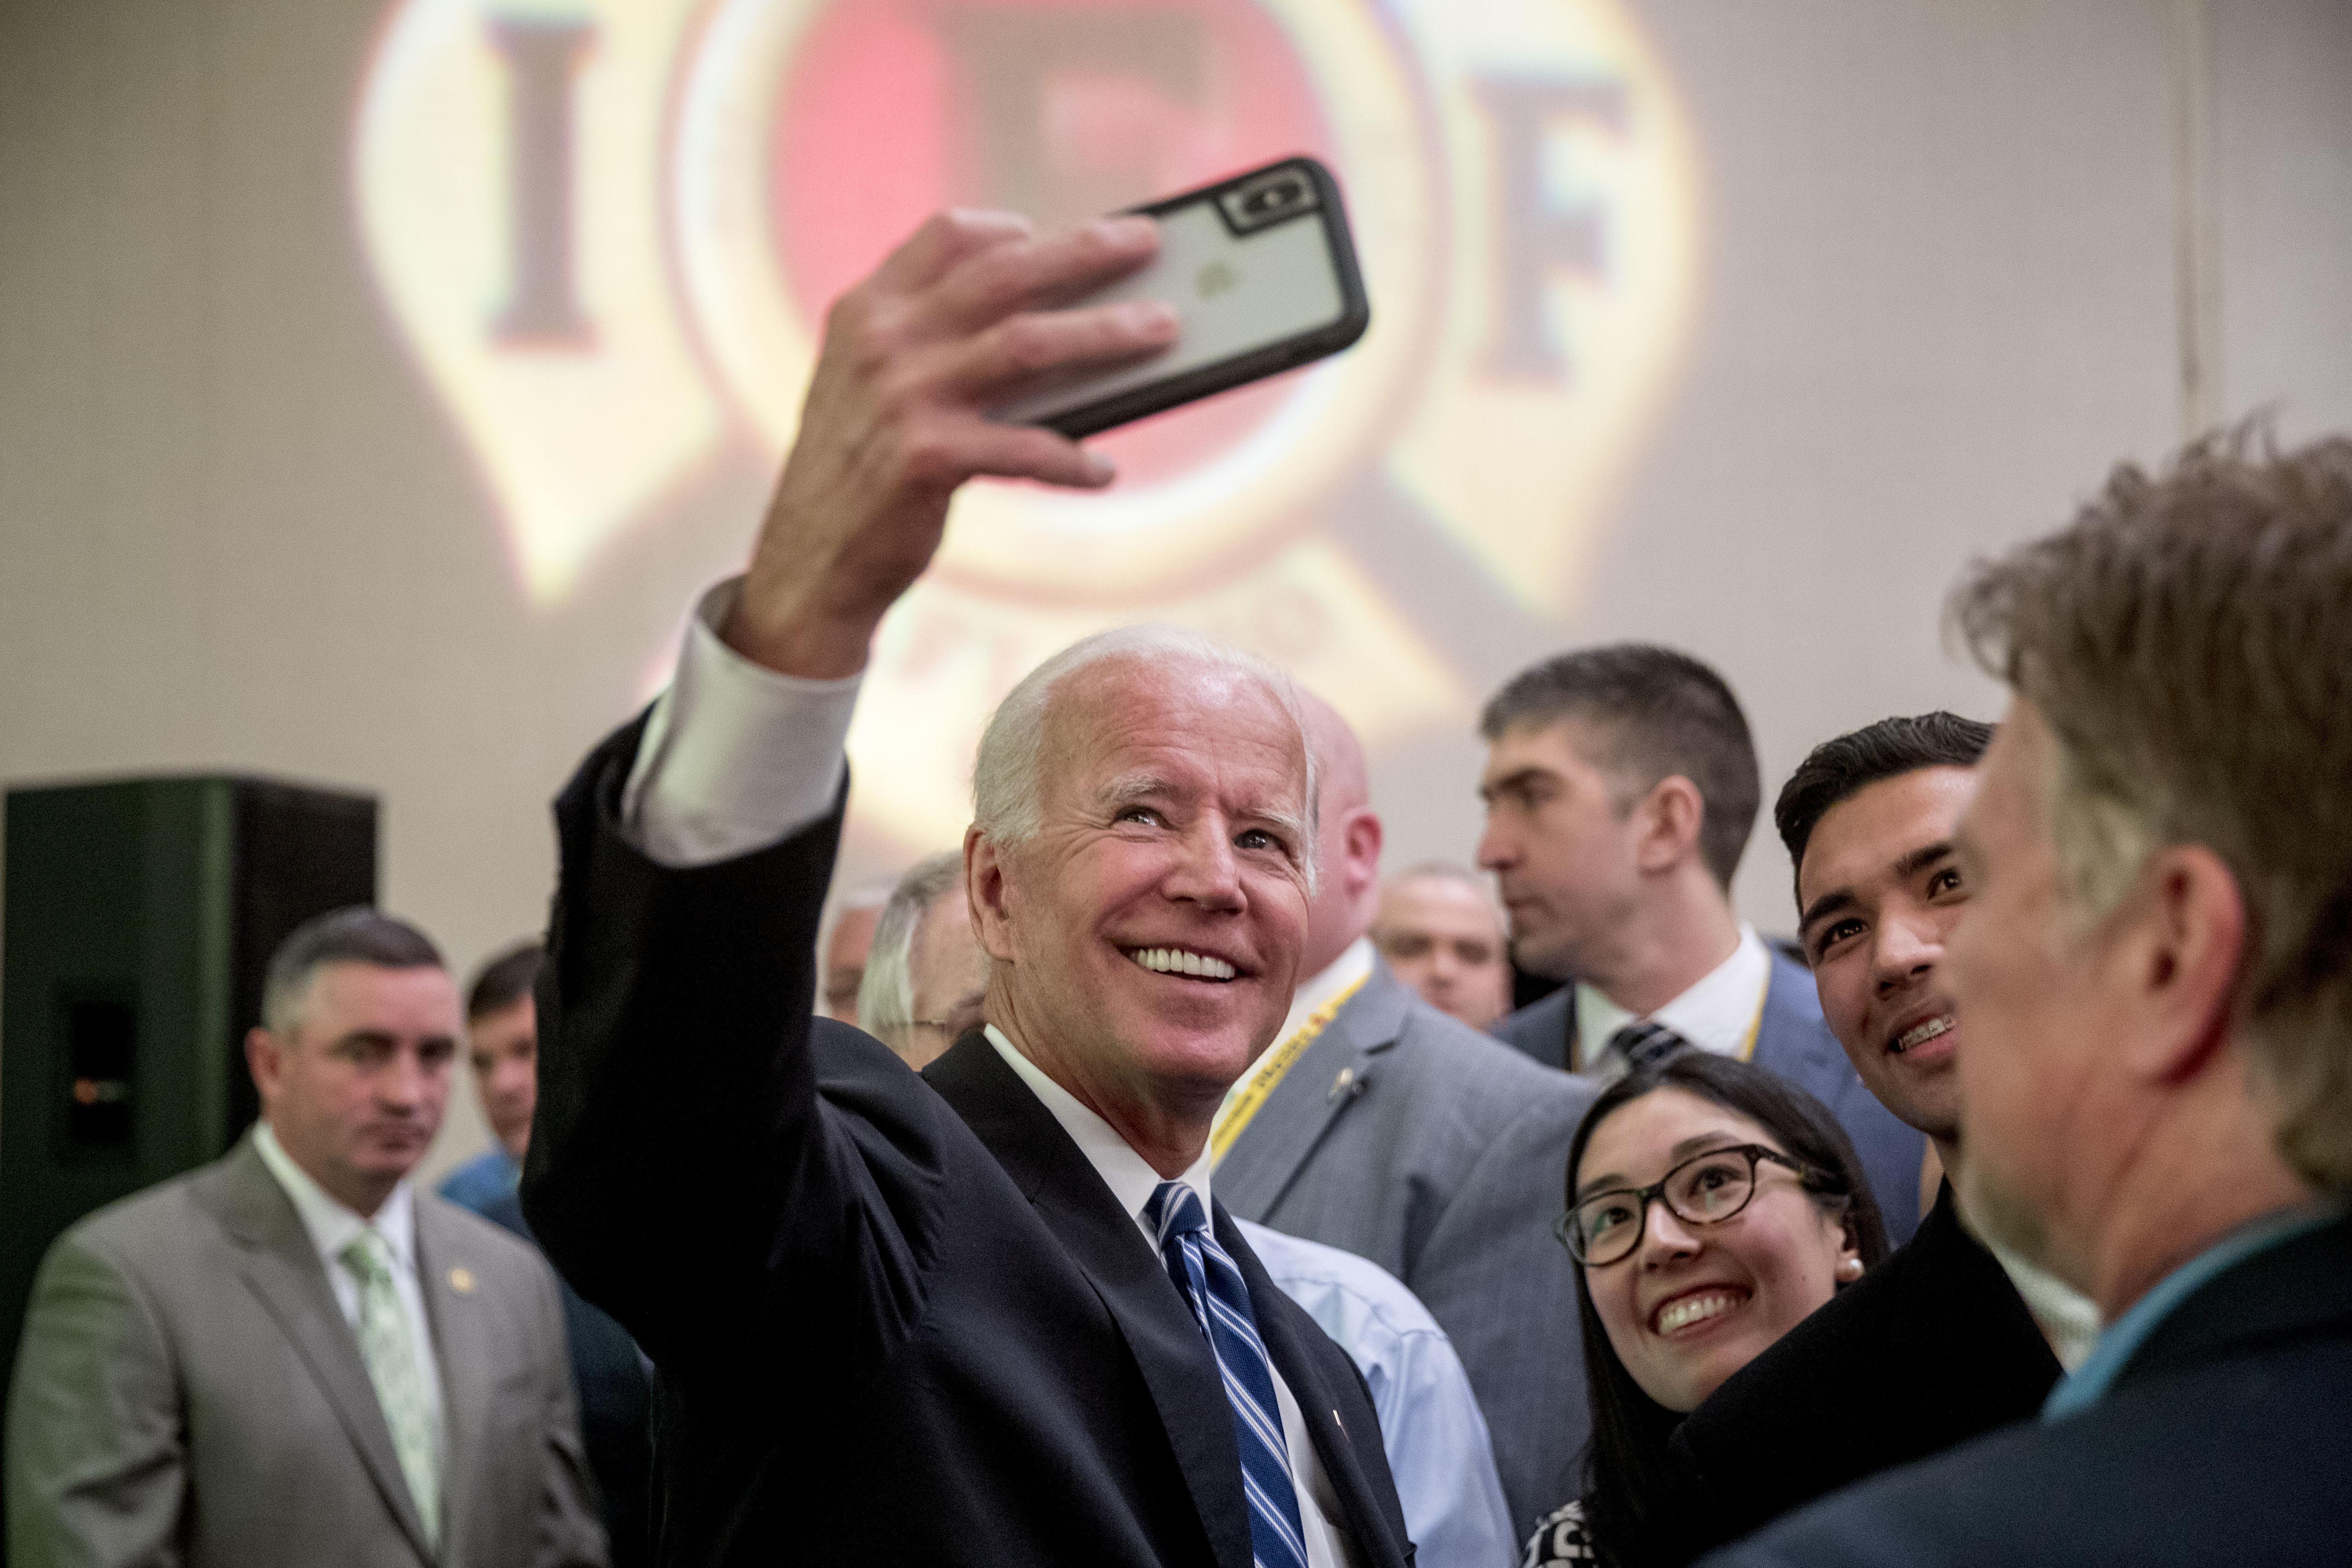 Trump dings Joe Biden as 'another low I.Q. individual'